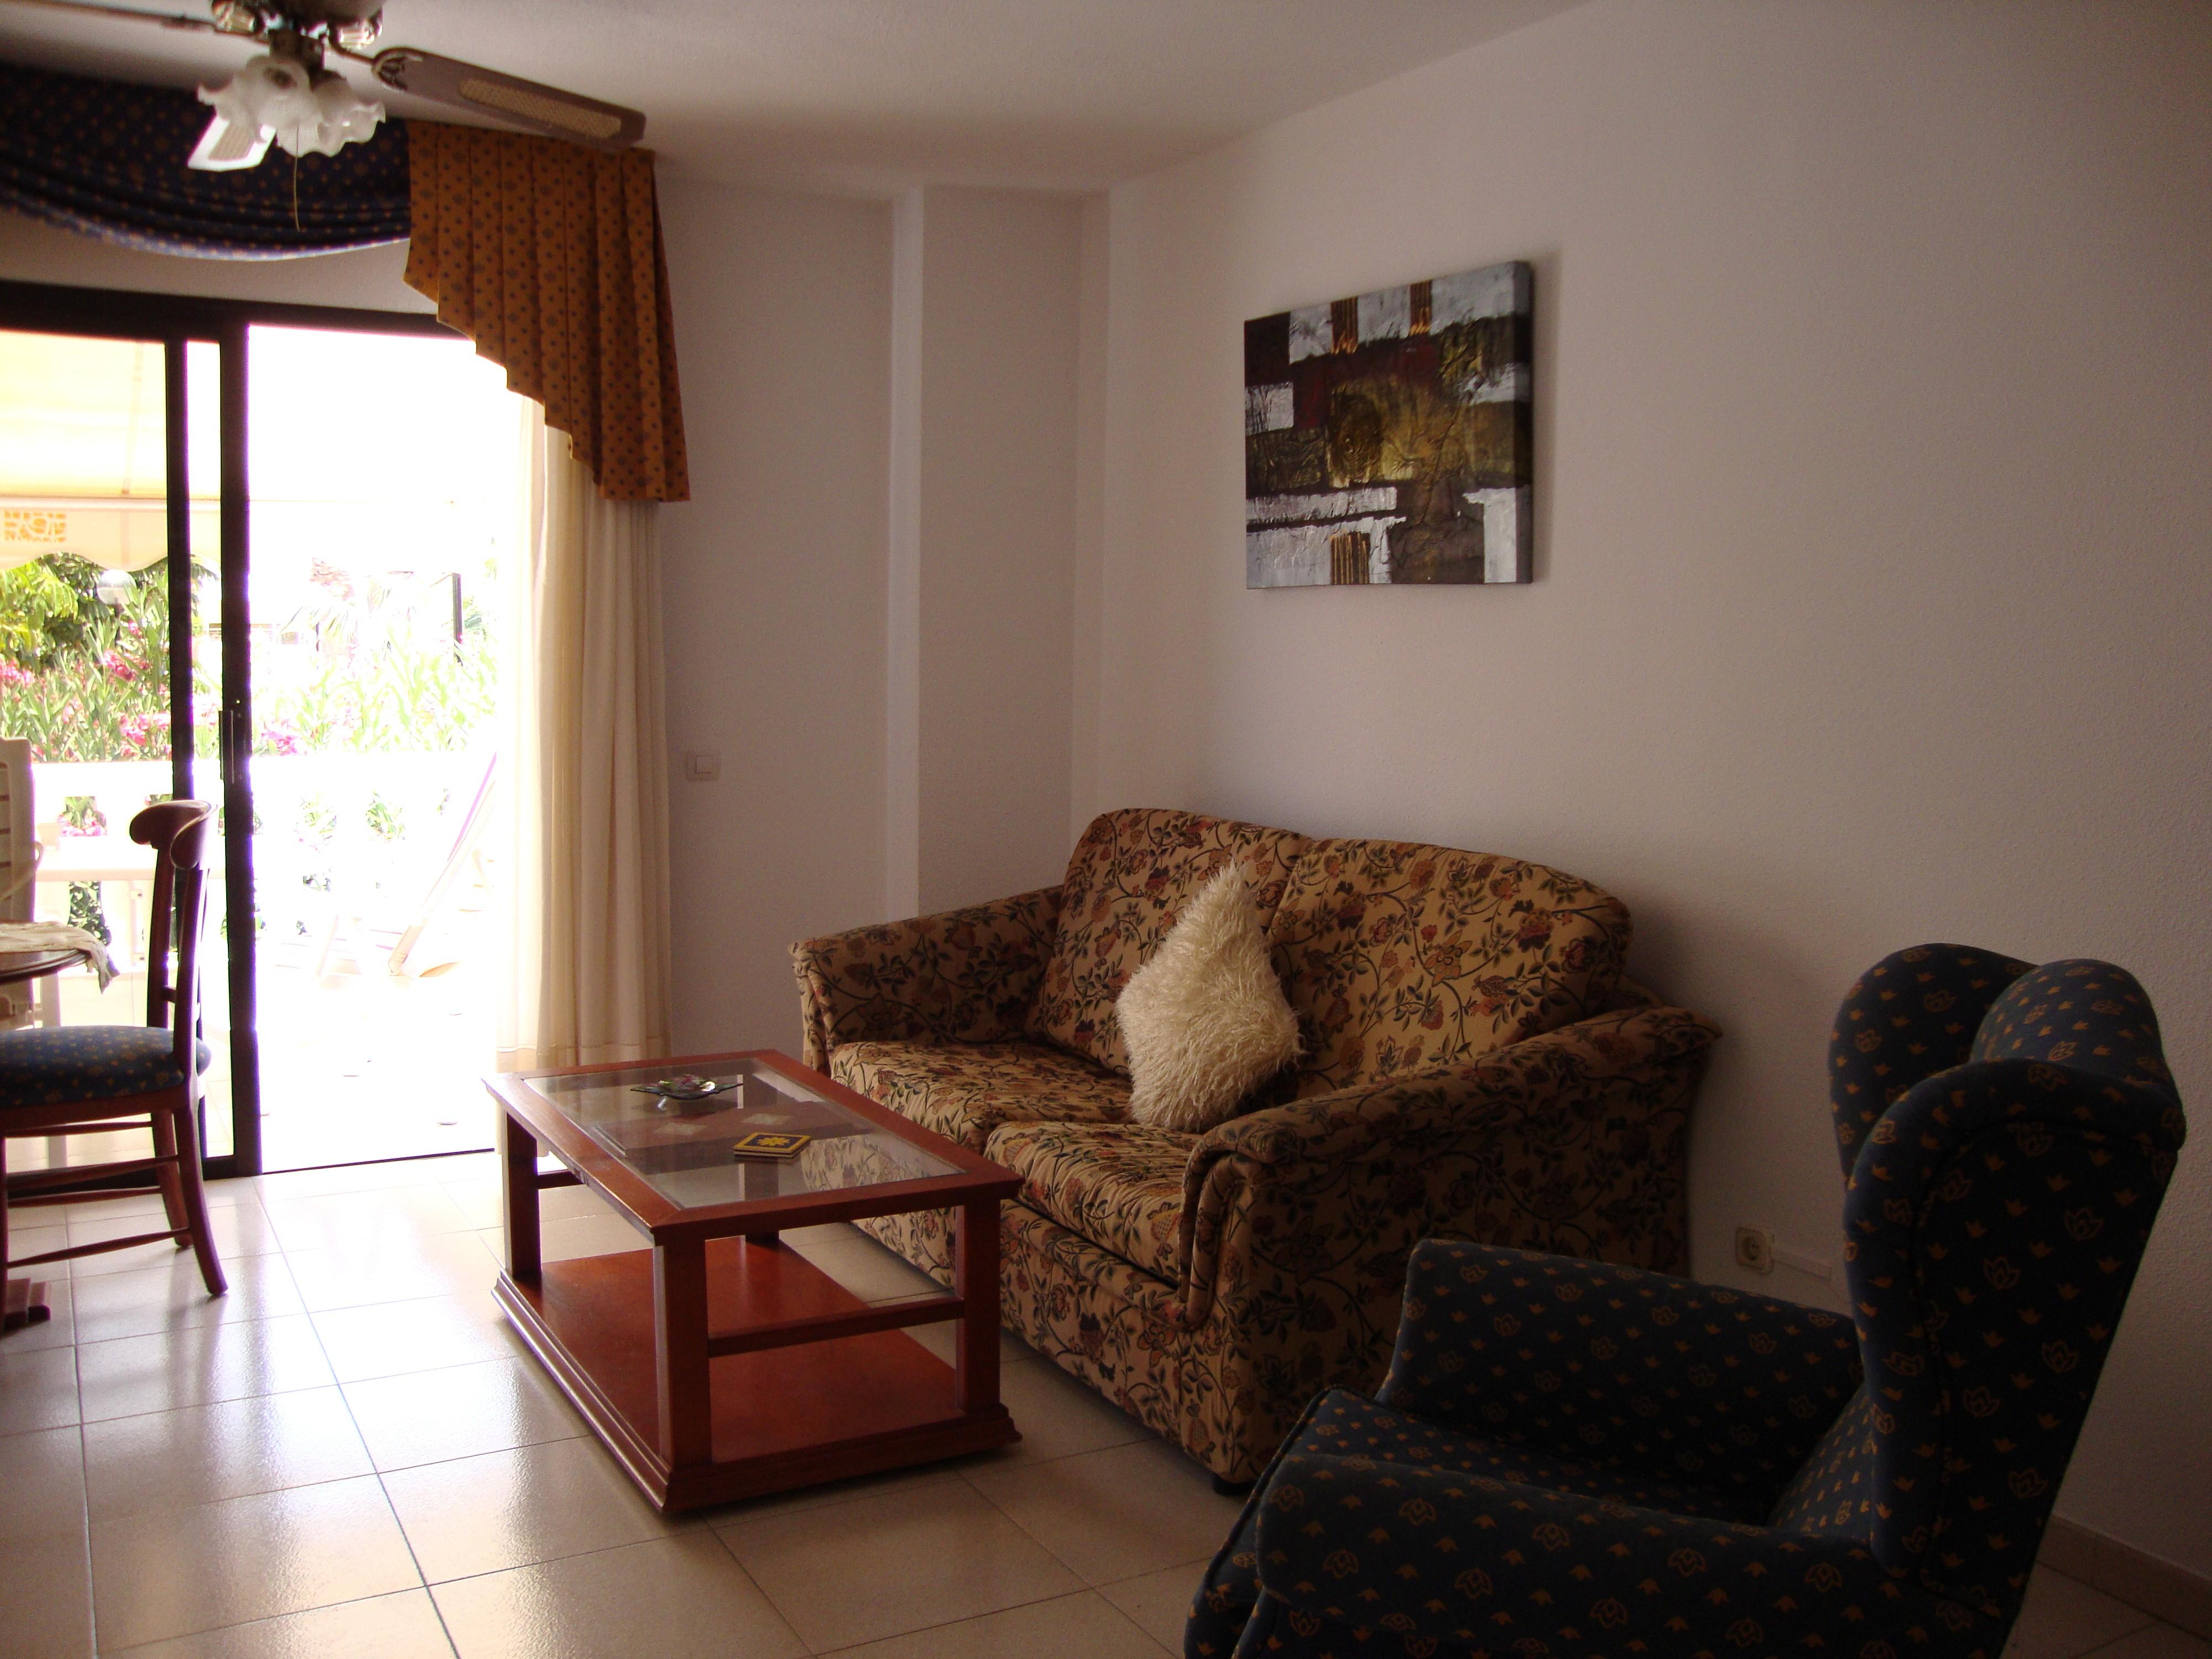 1 Bedroom Apartment (Ref 15), Tenerife Royal Gardens, Tenerife.